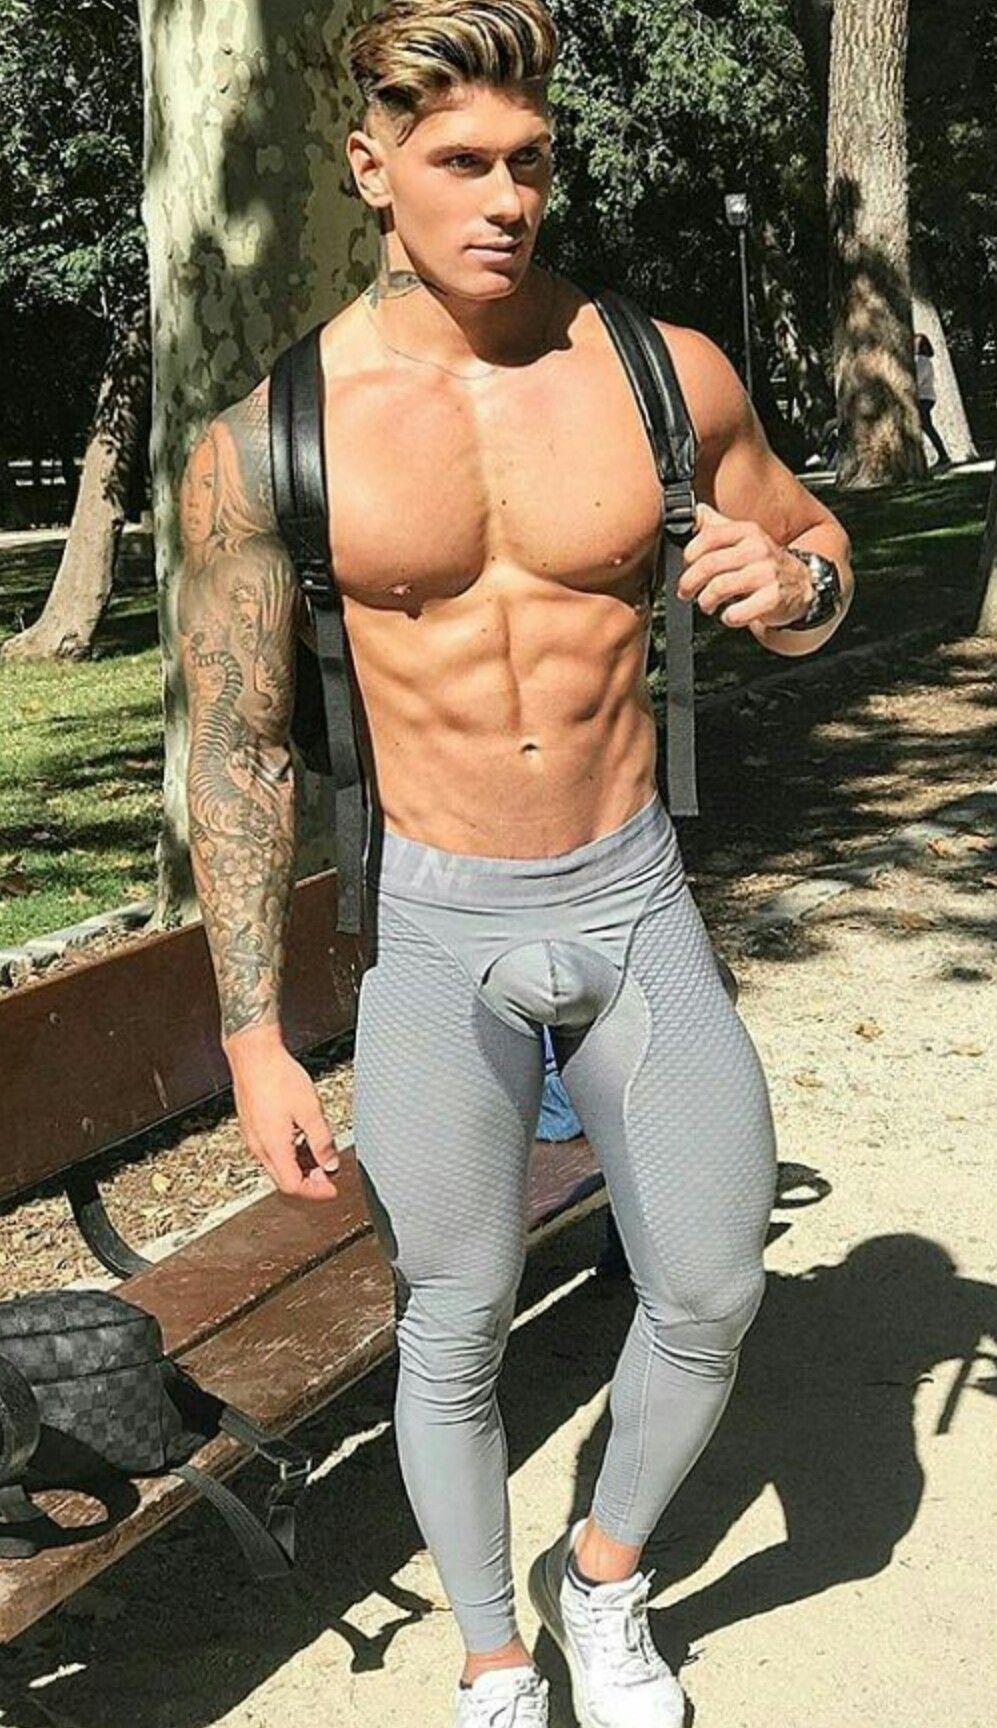 Super anal acrobat 33